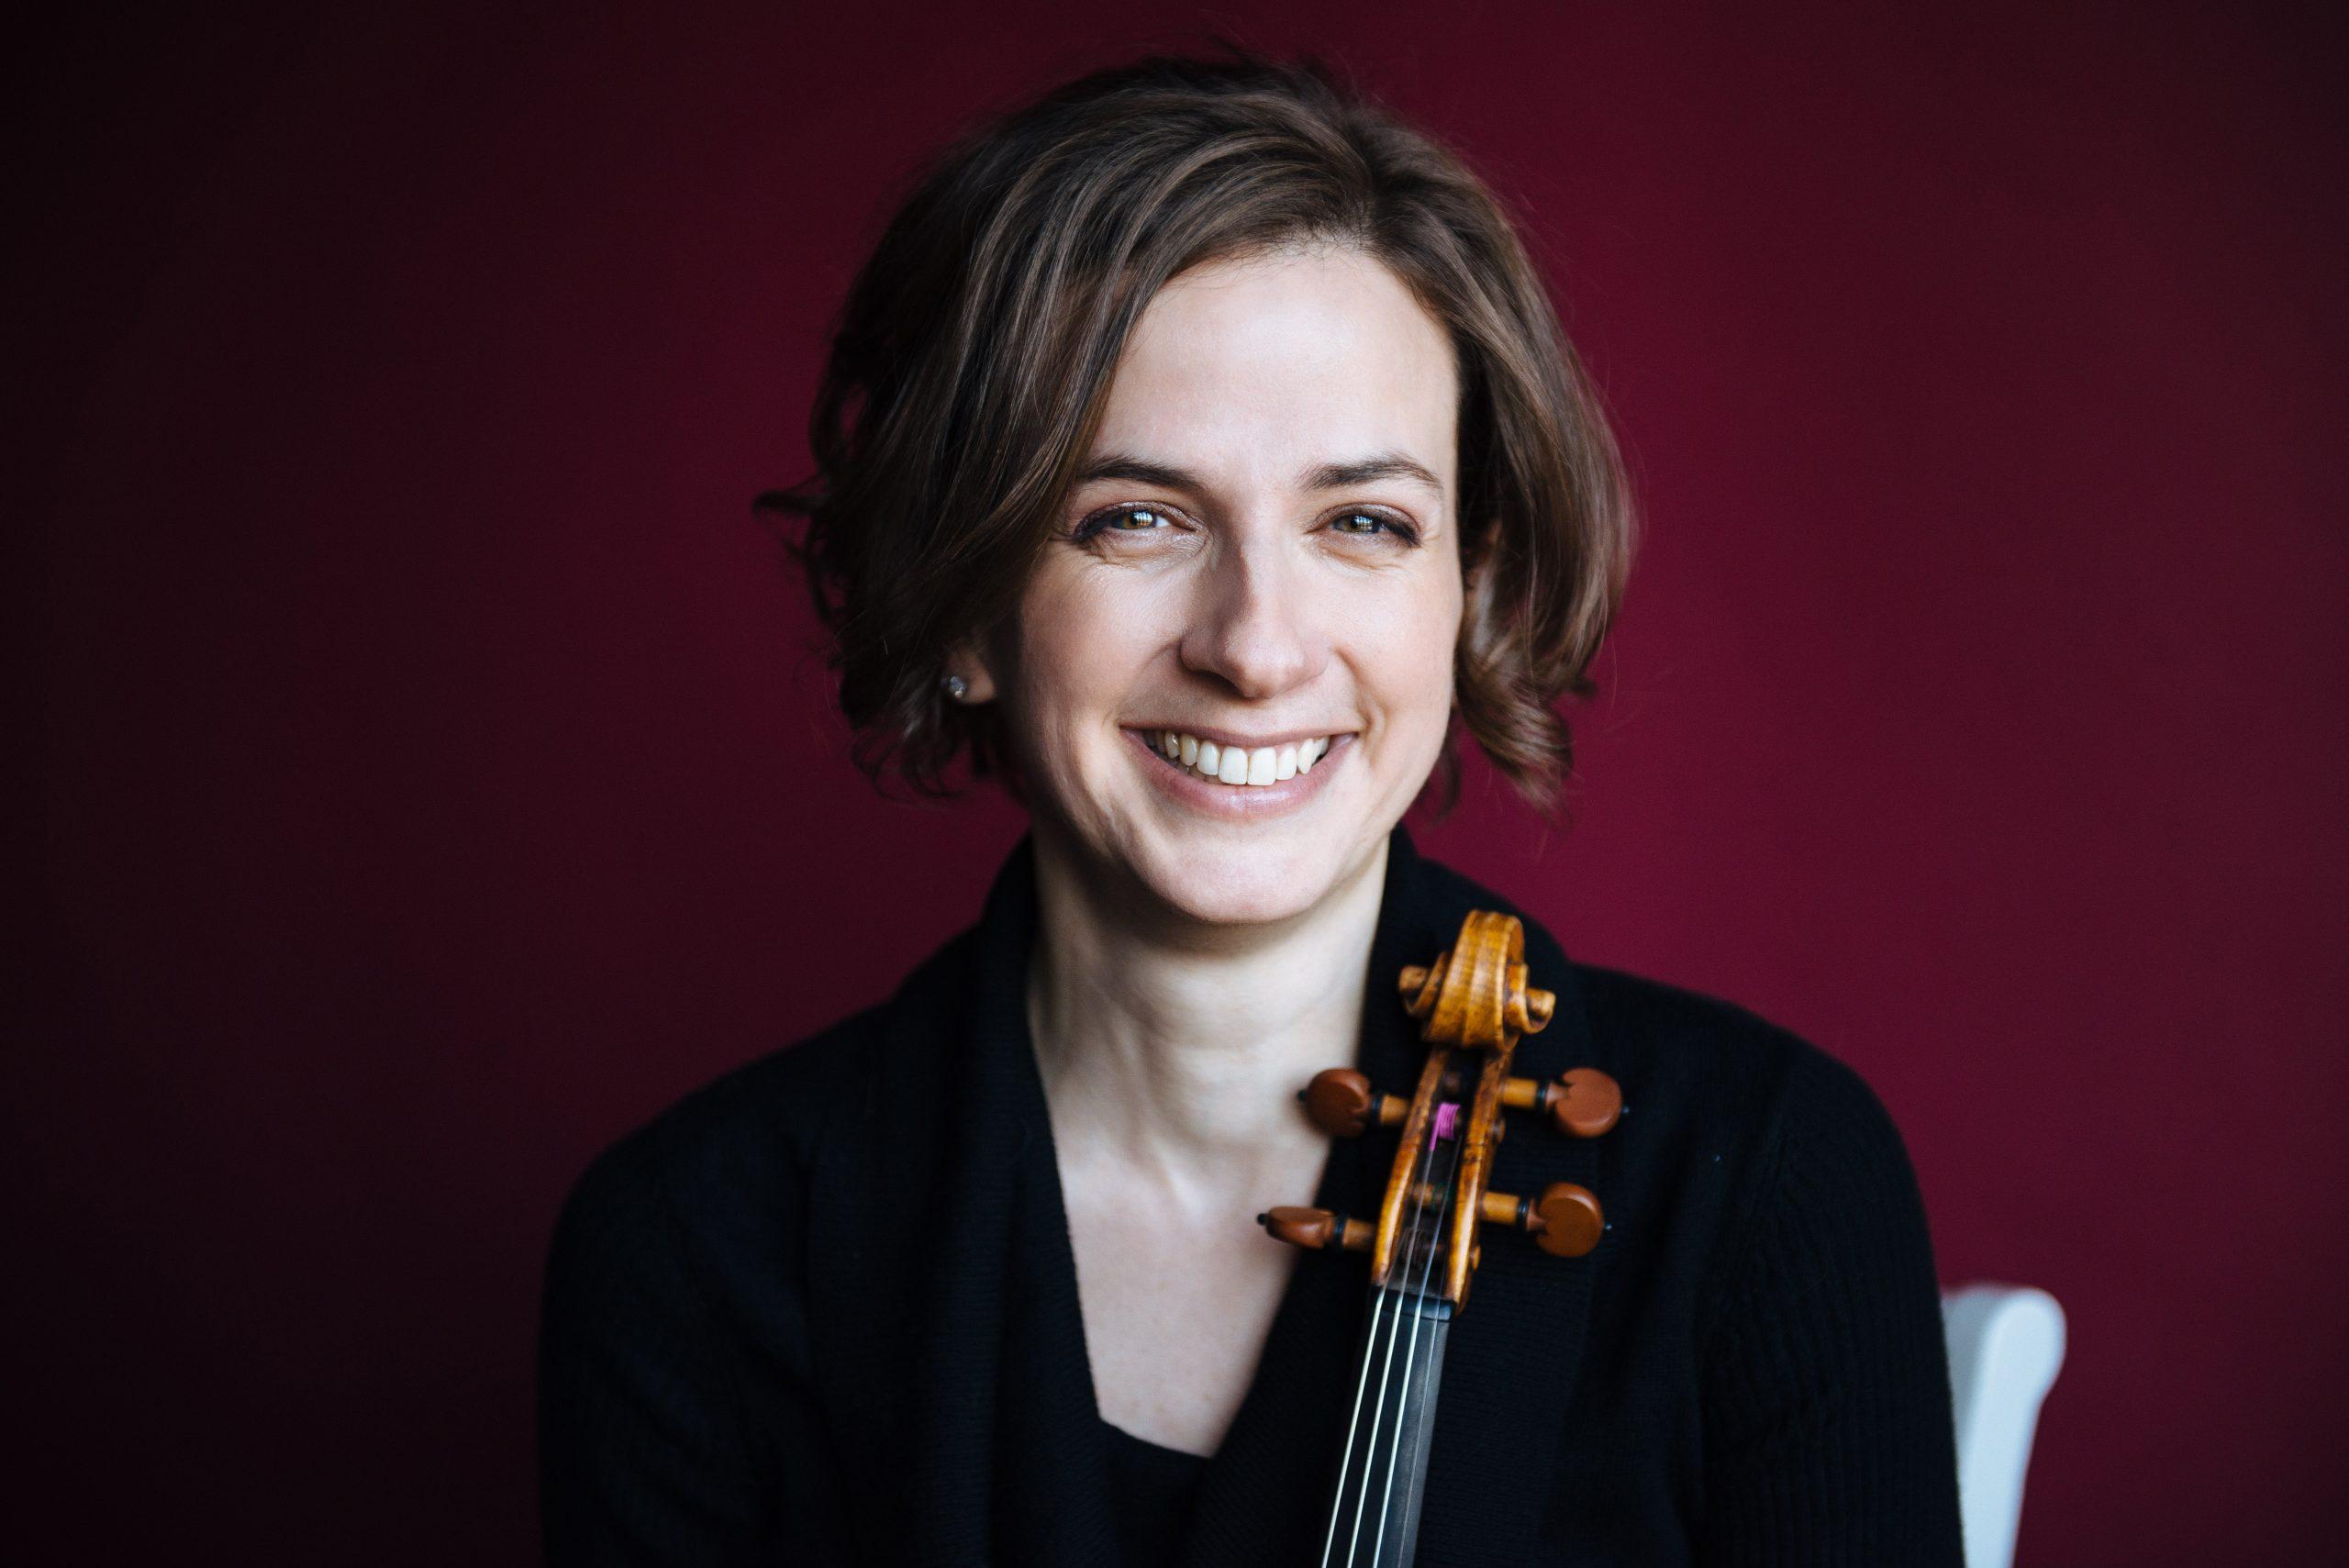 Liana Bérubé, viola